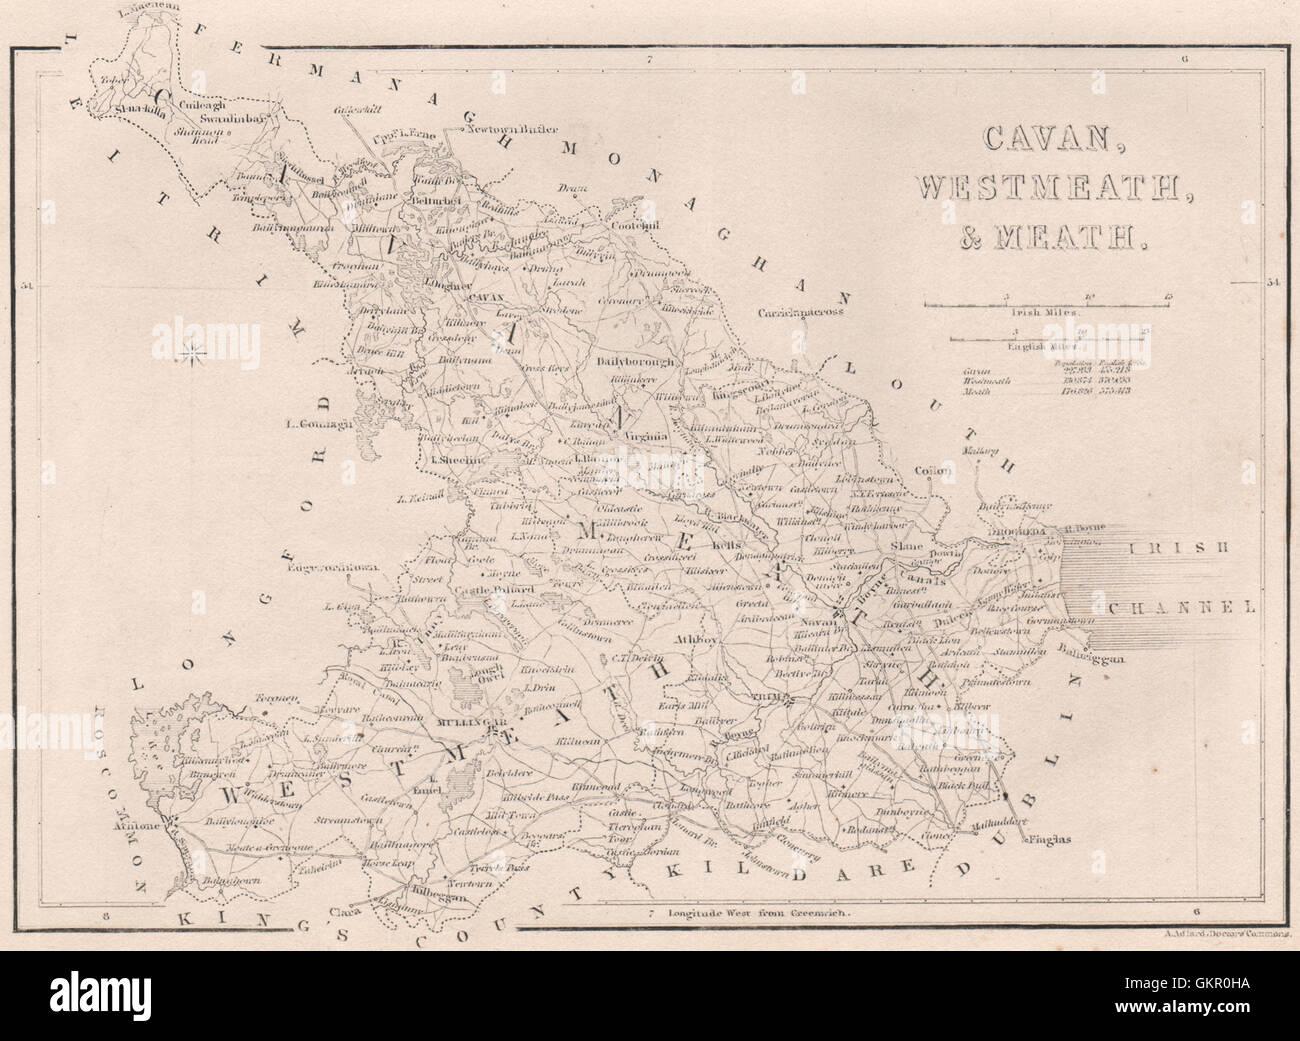 County Cavan County Westmeath County Meath Ireland 1835 Antique